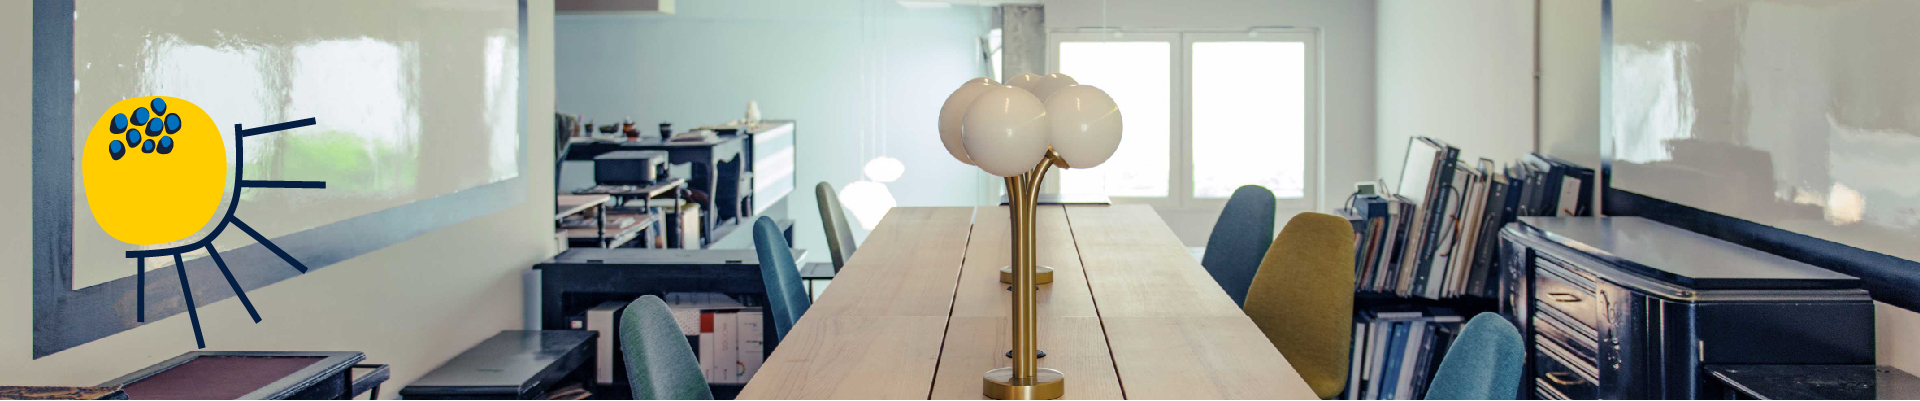 table-lampe-design